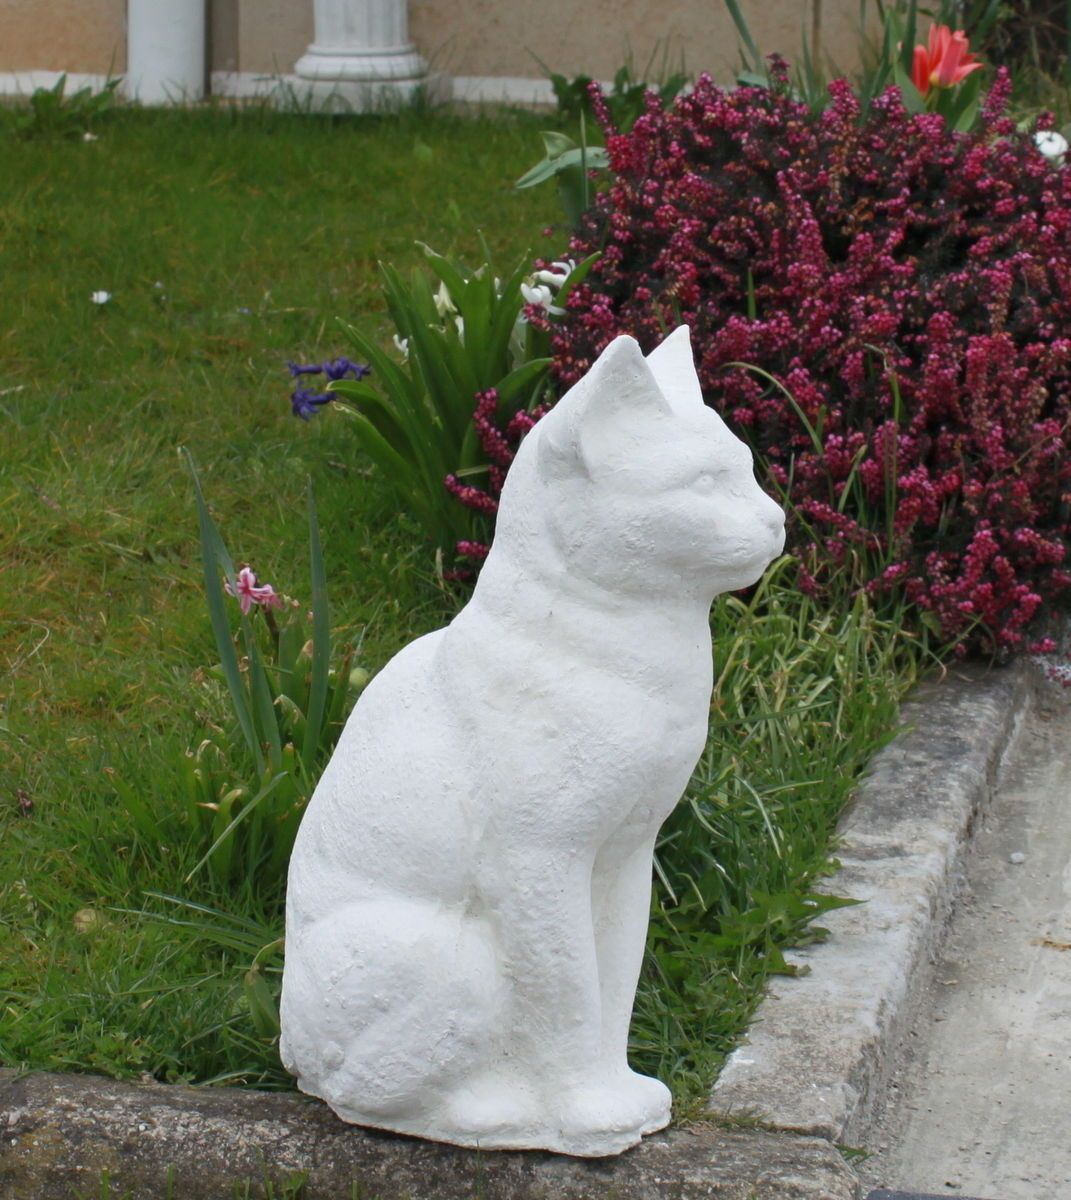 Statue Chat Egyptien En Pierre Reconstituee Ton Pierre Blanche